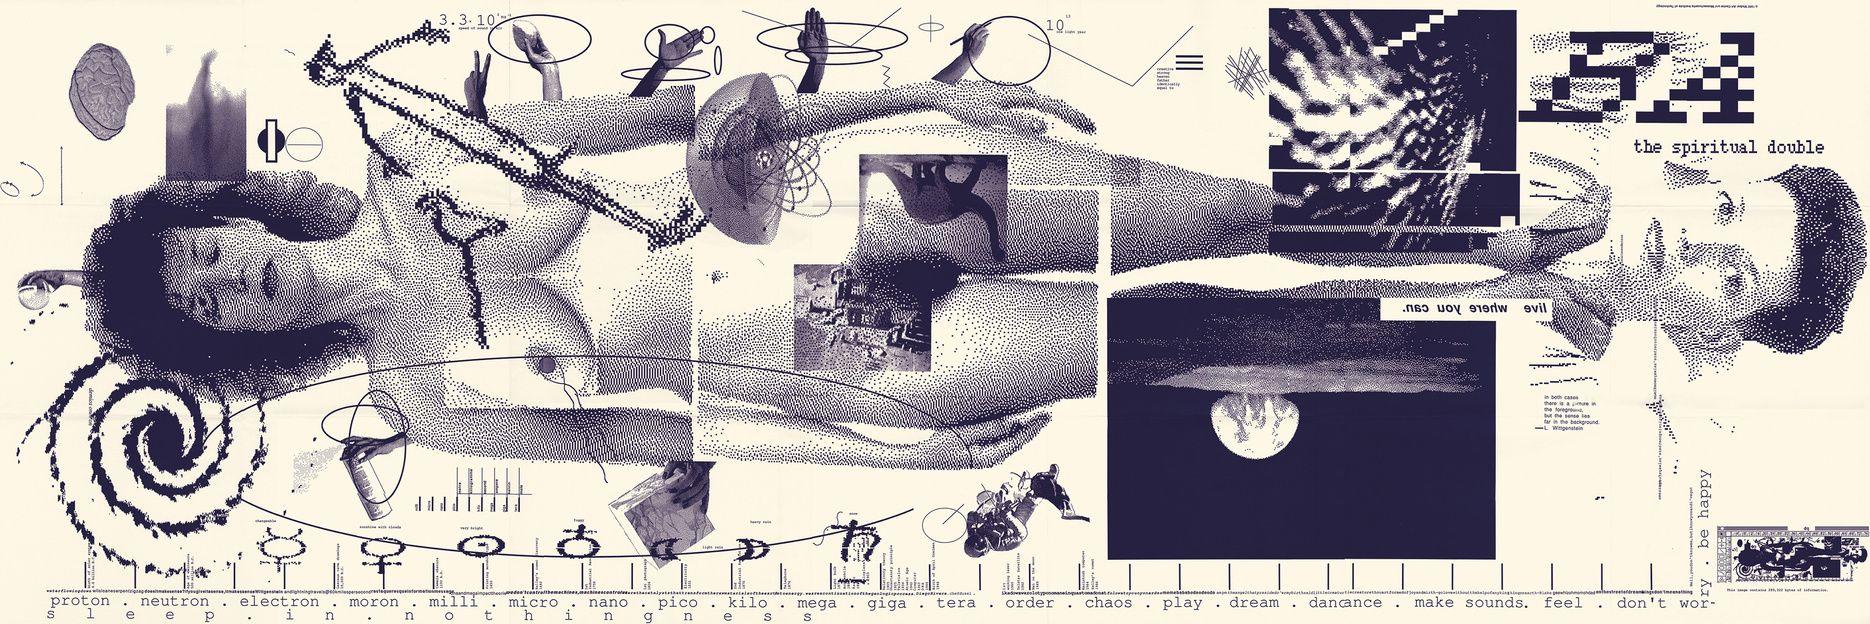 fig.7: April Greiman Design Quarterly issue 133 poster, 1986